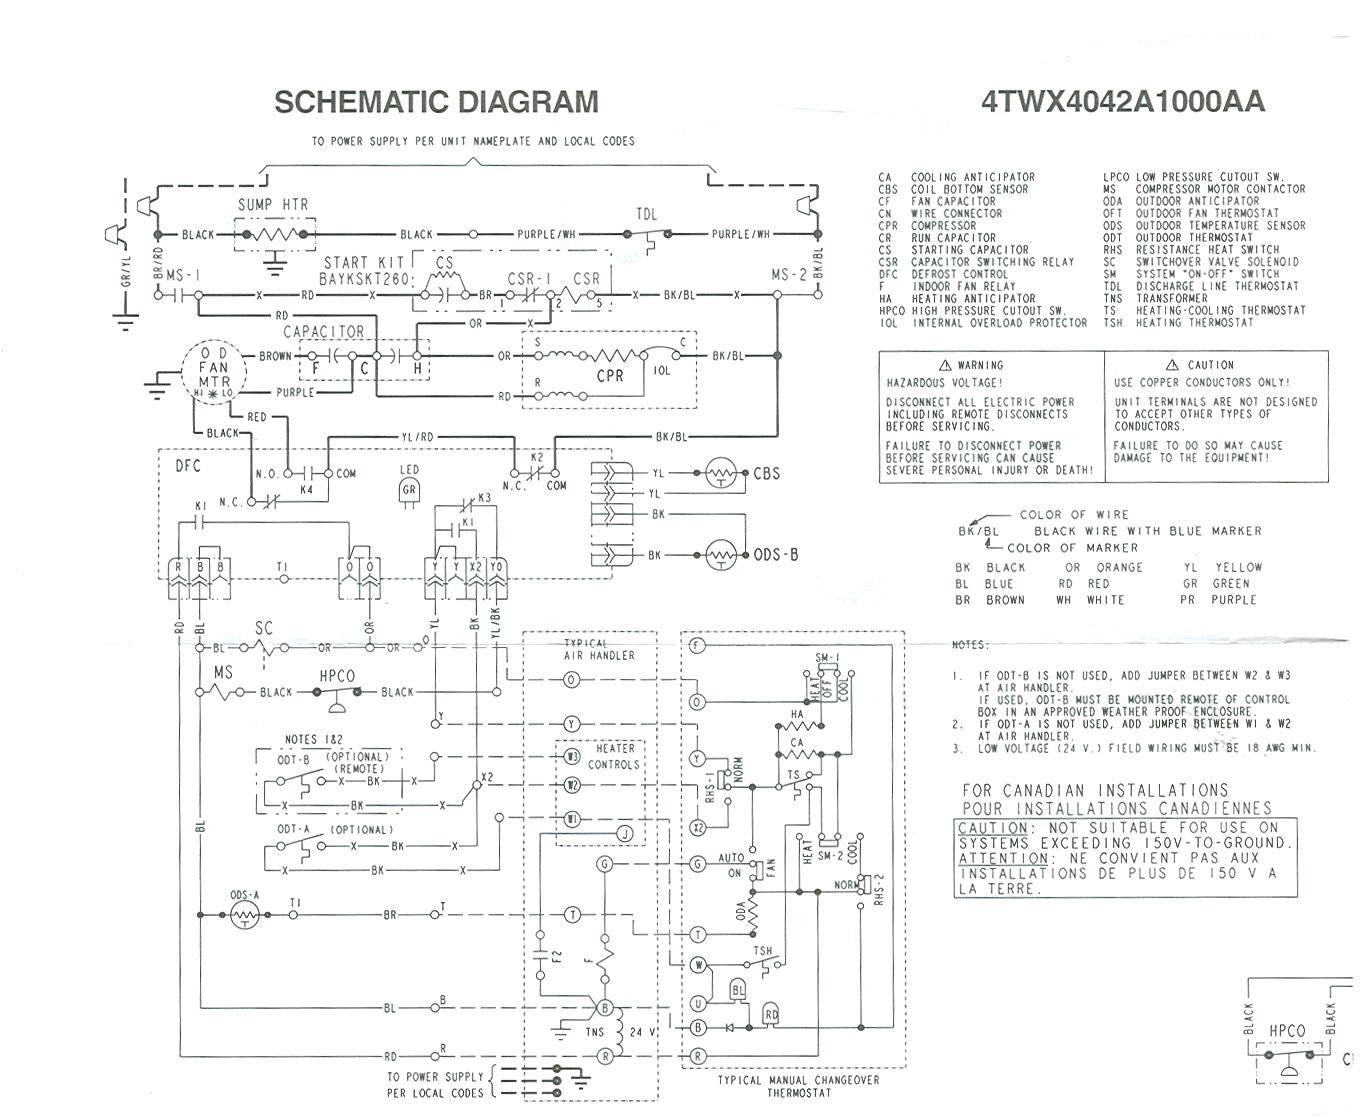 hight resolution of trane wiring diagram heat pump wiring diagram for trane xr14 heat pump train pumps 17t